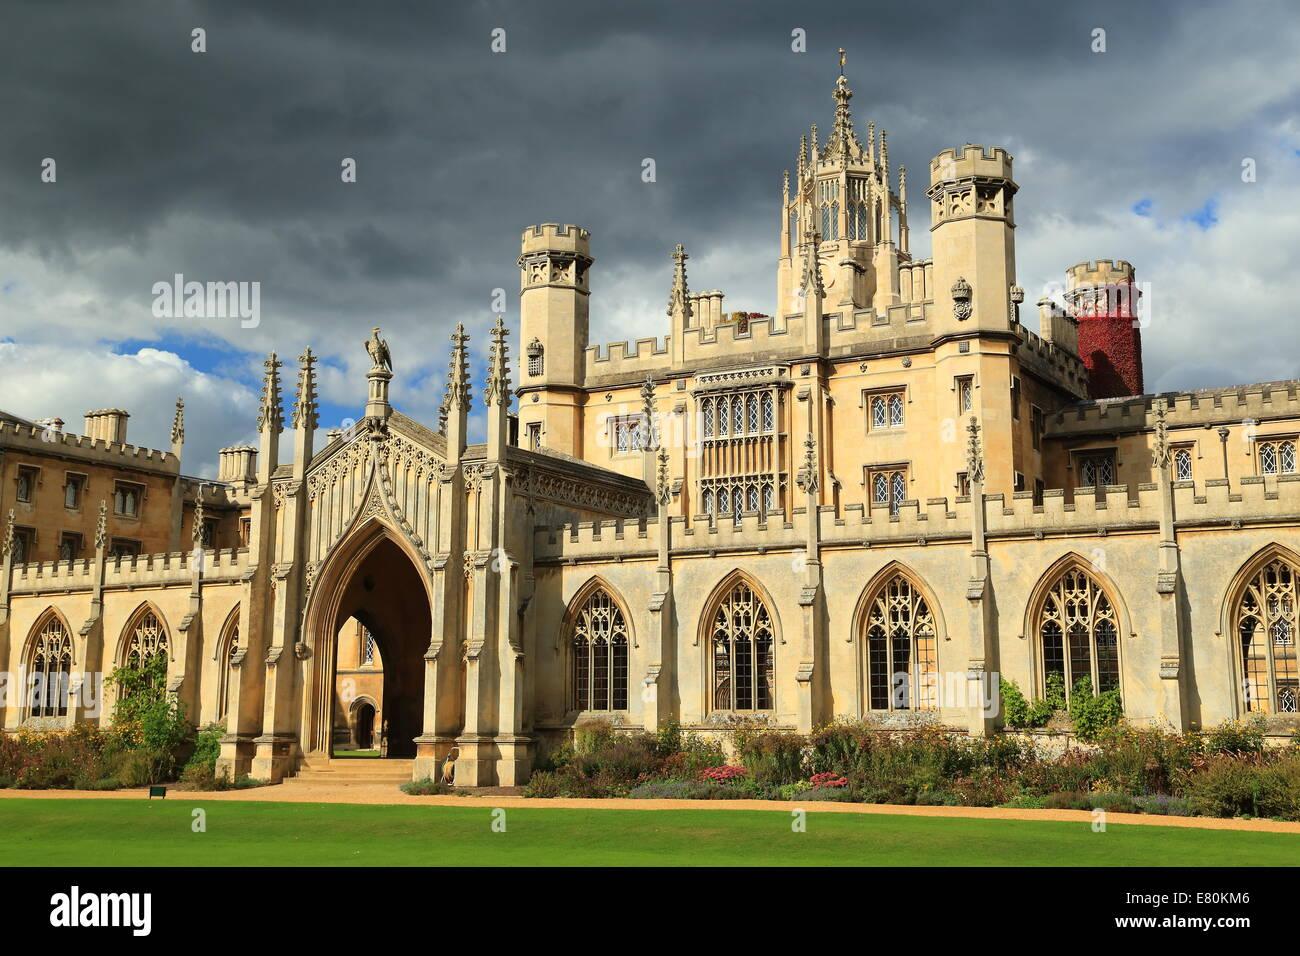 St John's college, Cambridge, UK. - Stock Image